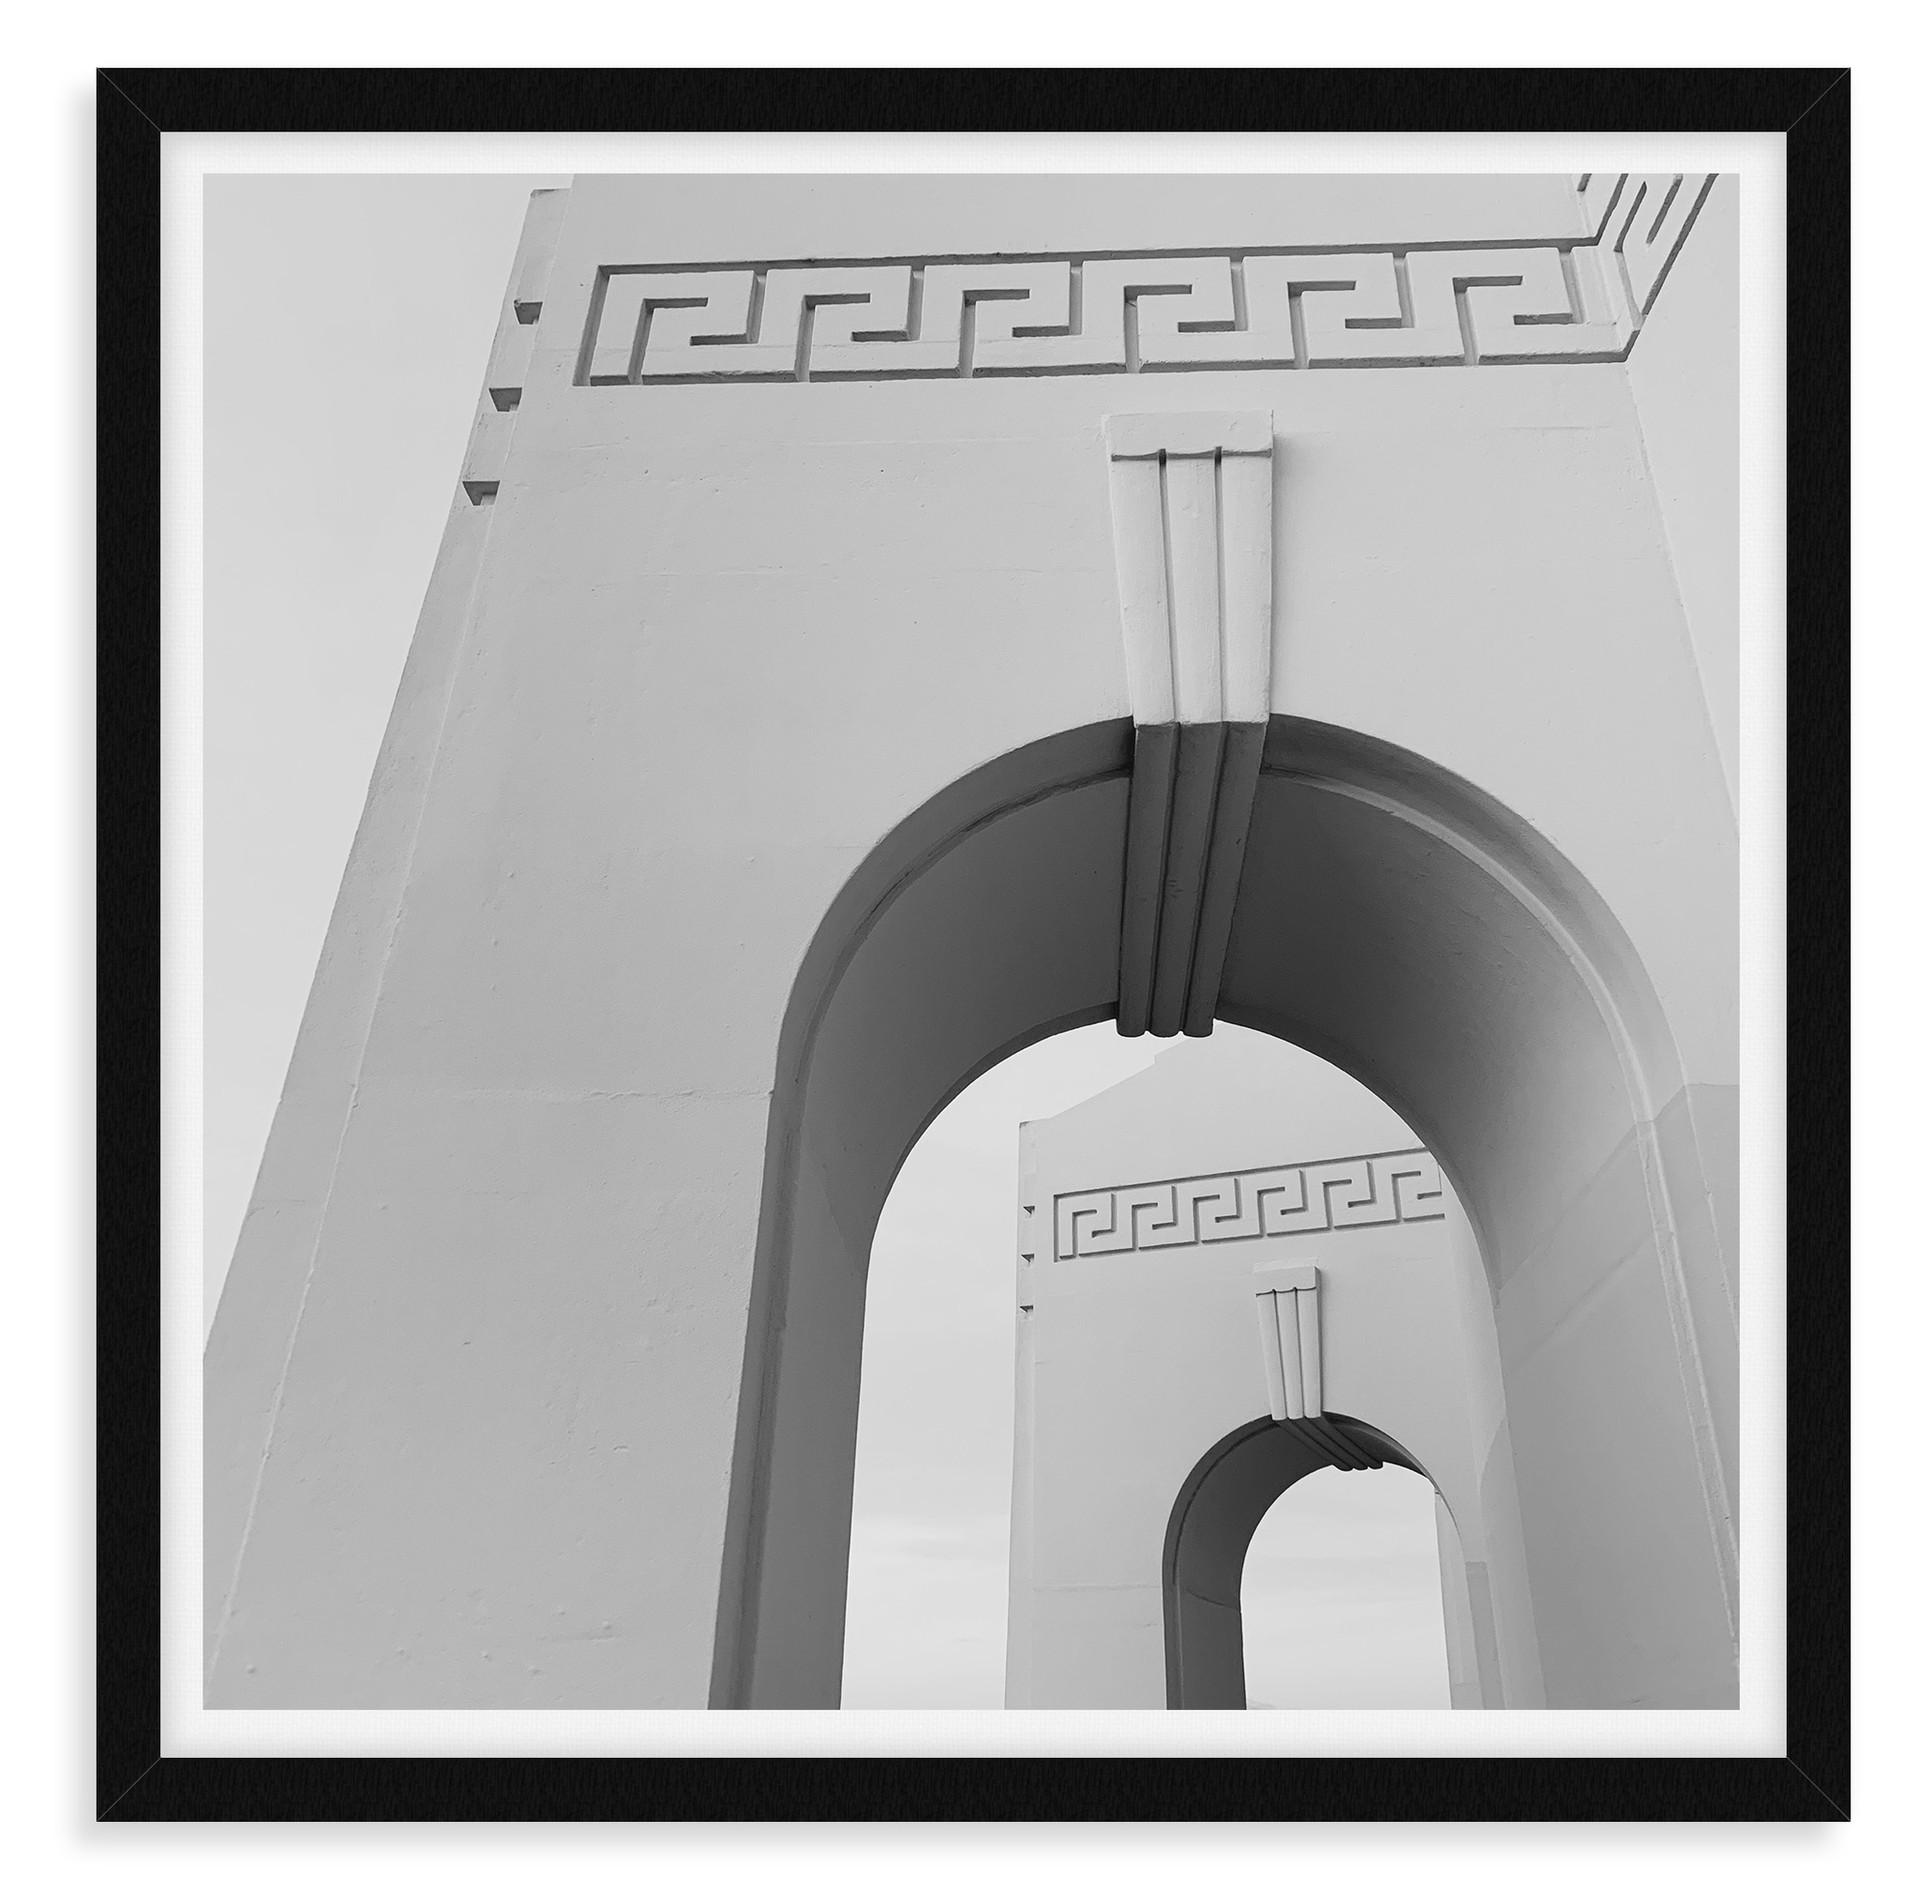 griffith park observatory arches archite